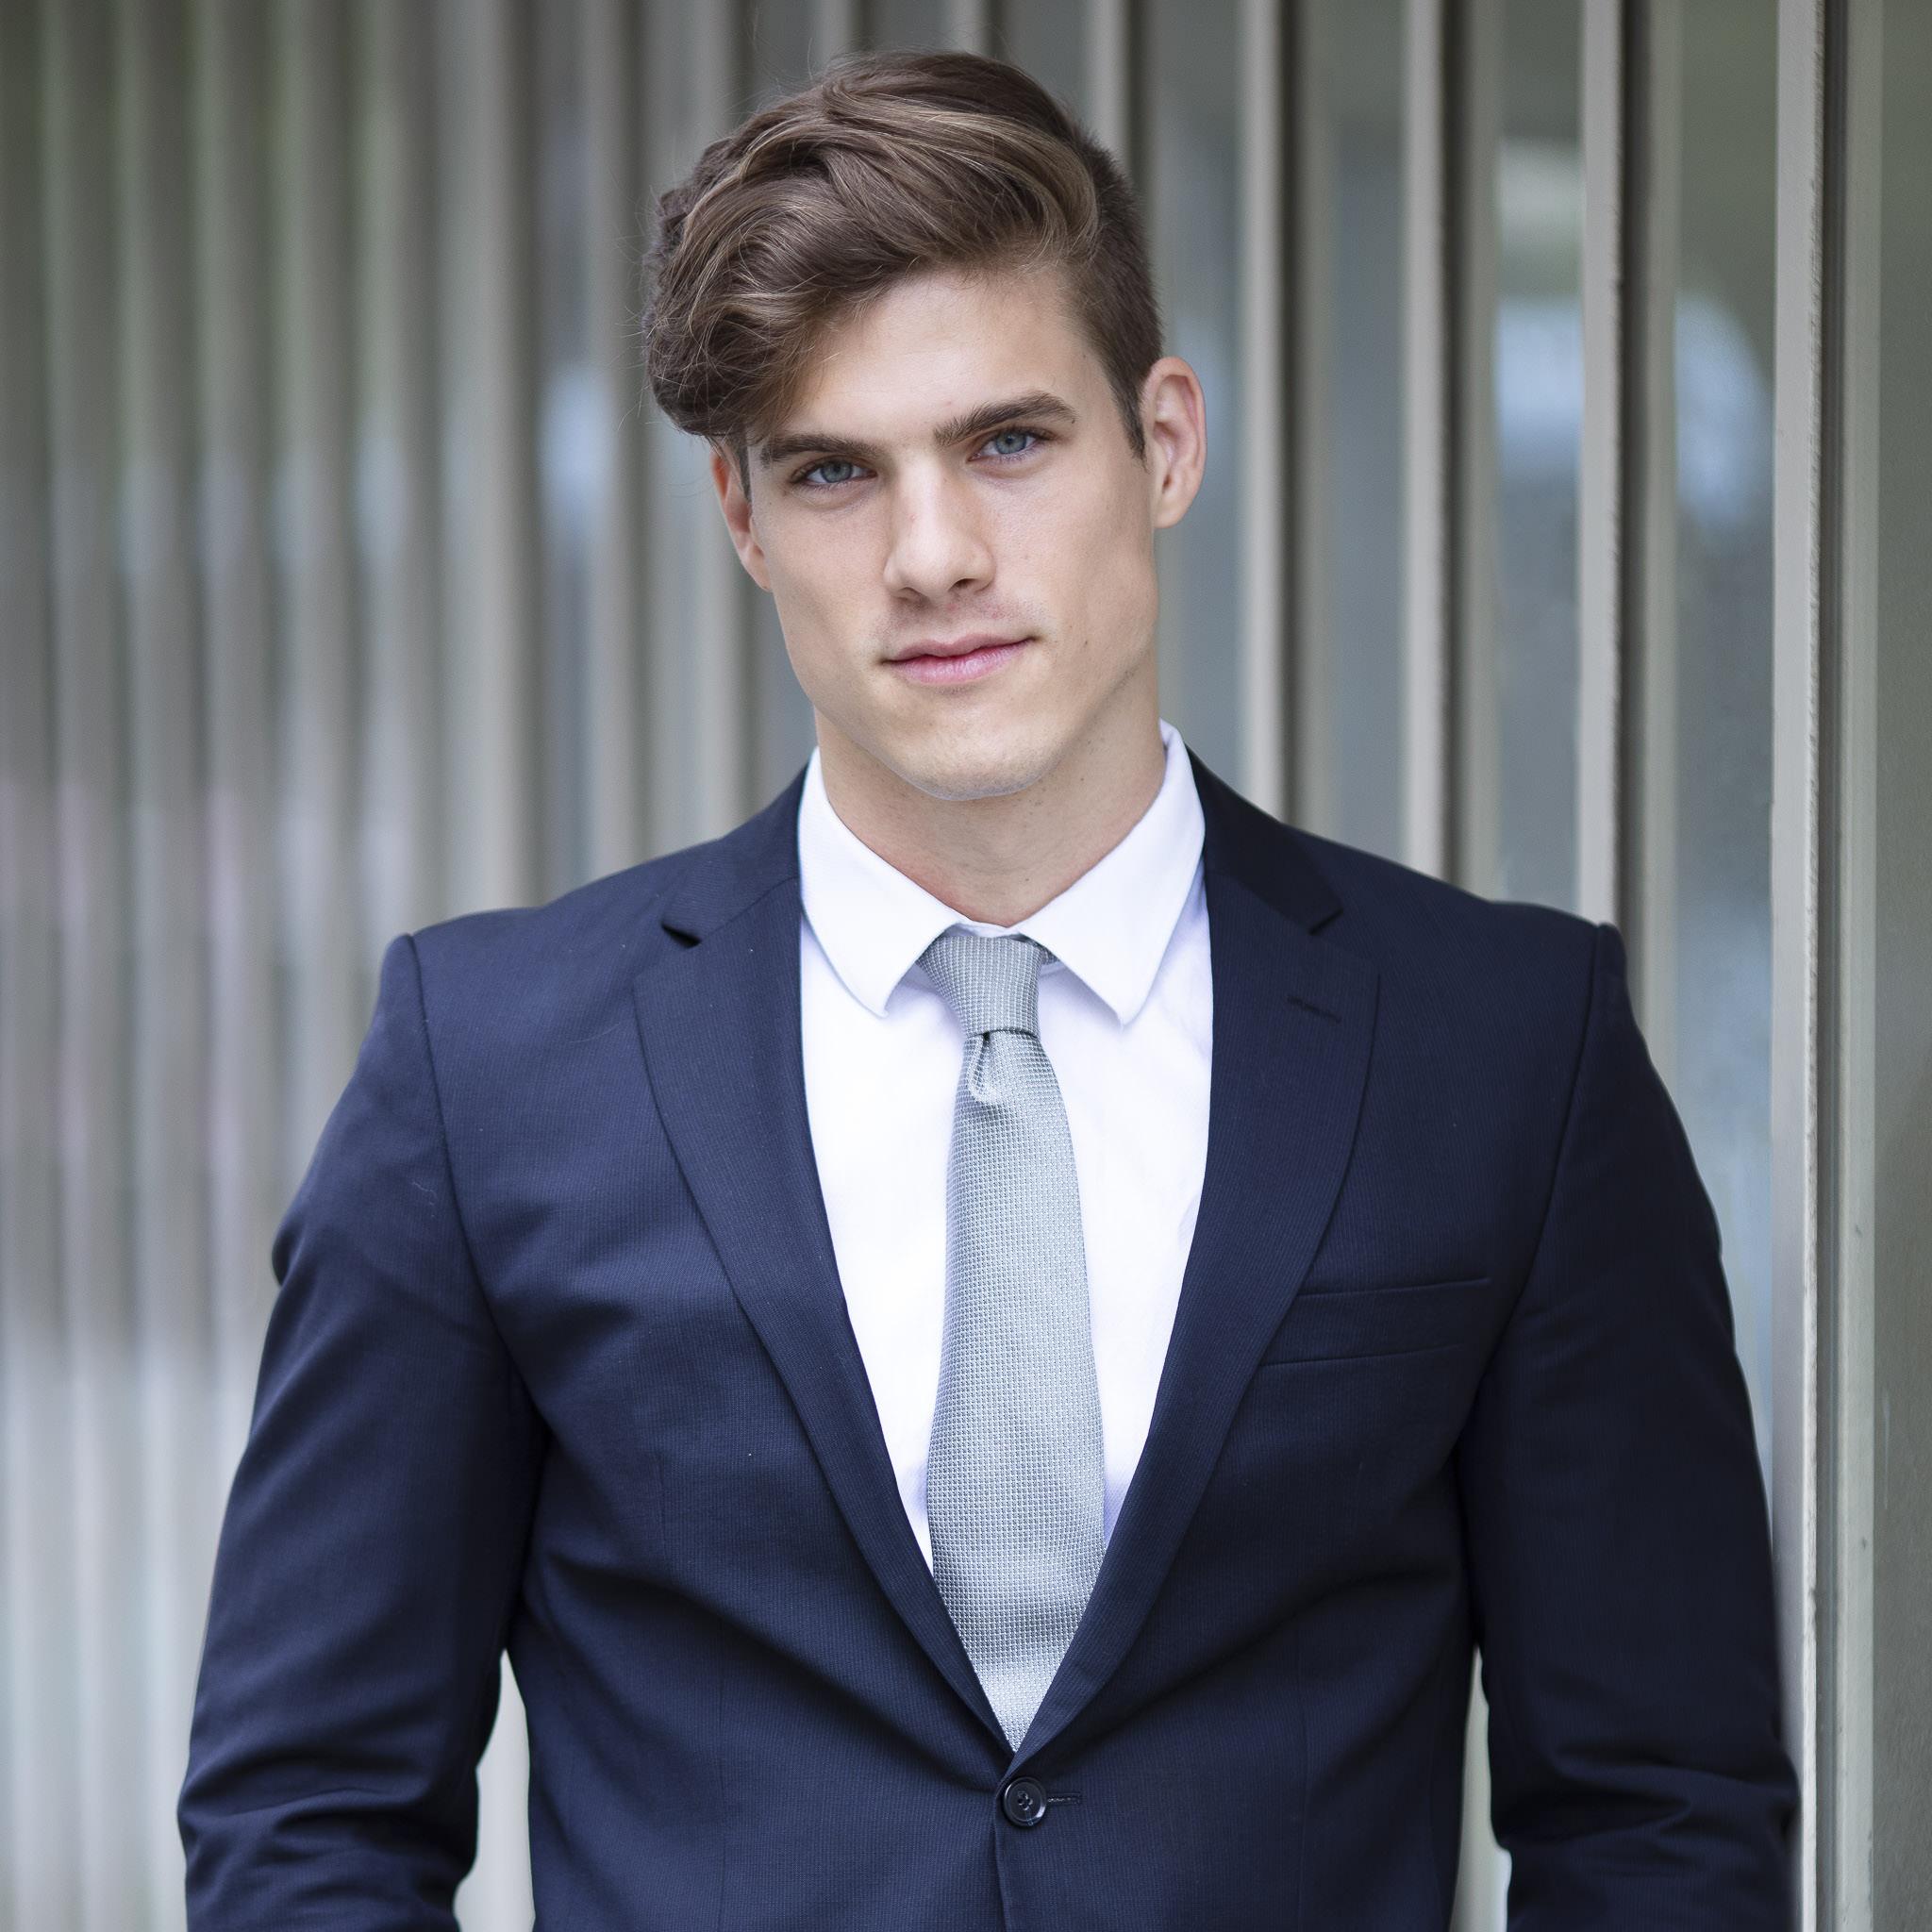 Elias Hartmann Bewerbung3